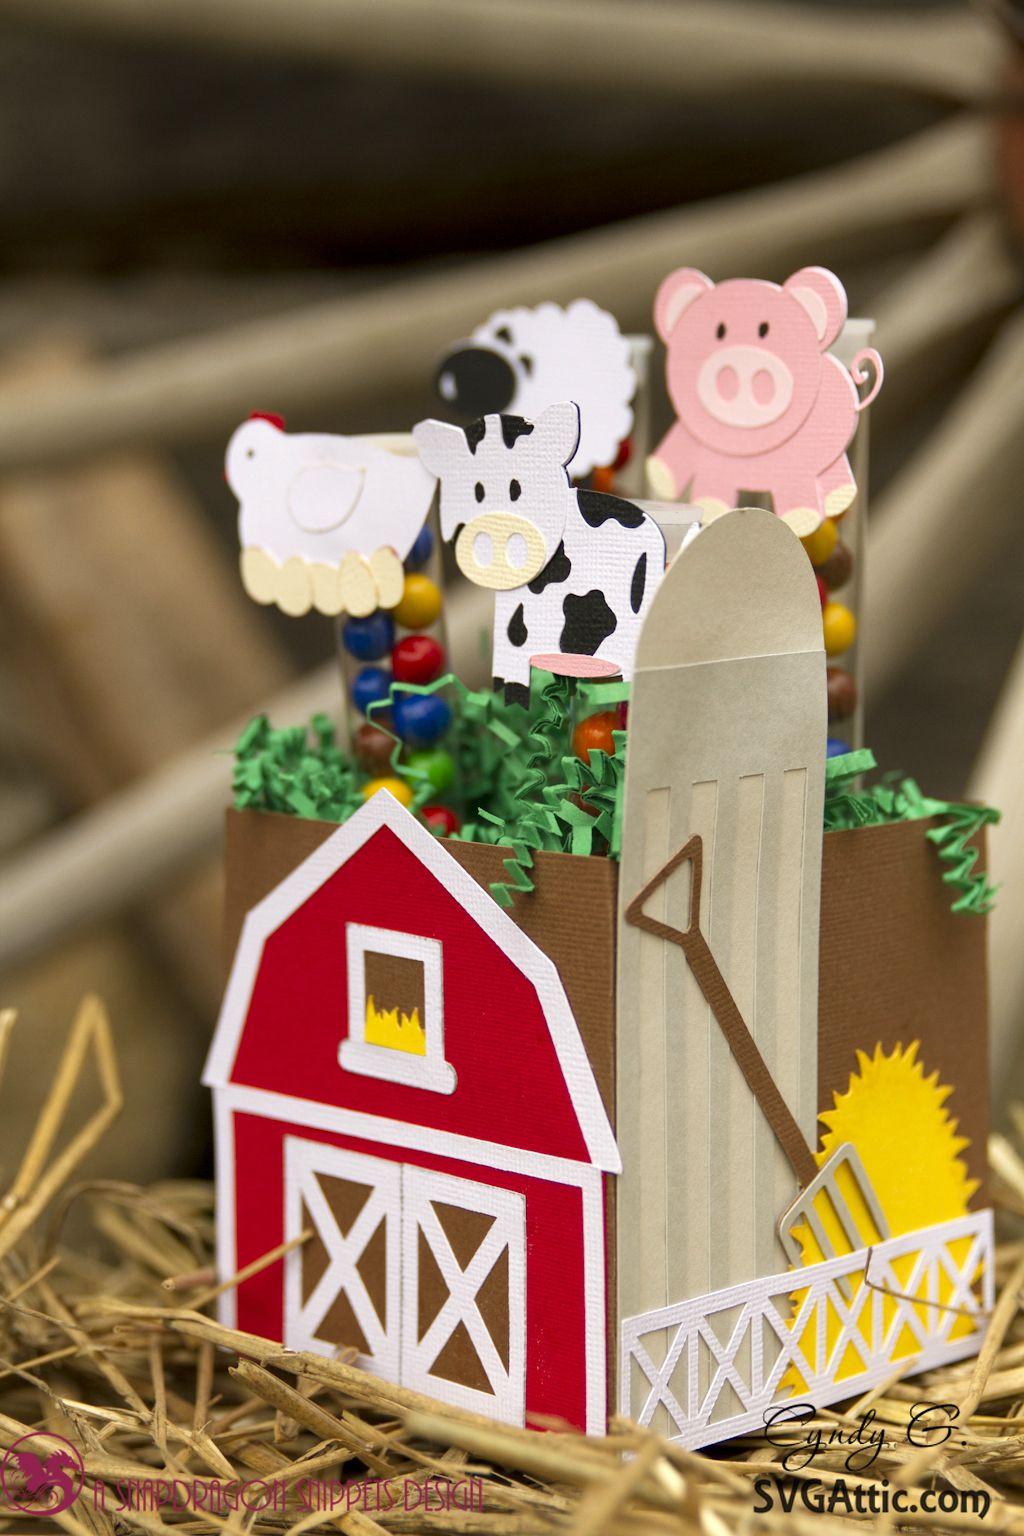 SVG Attic Down on the Farm treats svgattic Farm